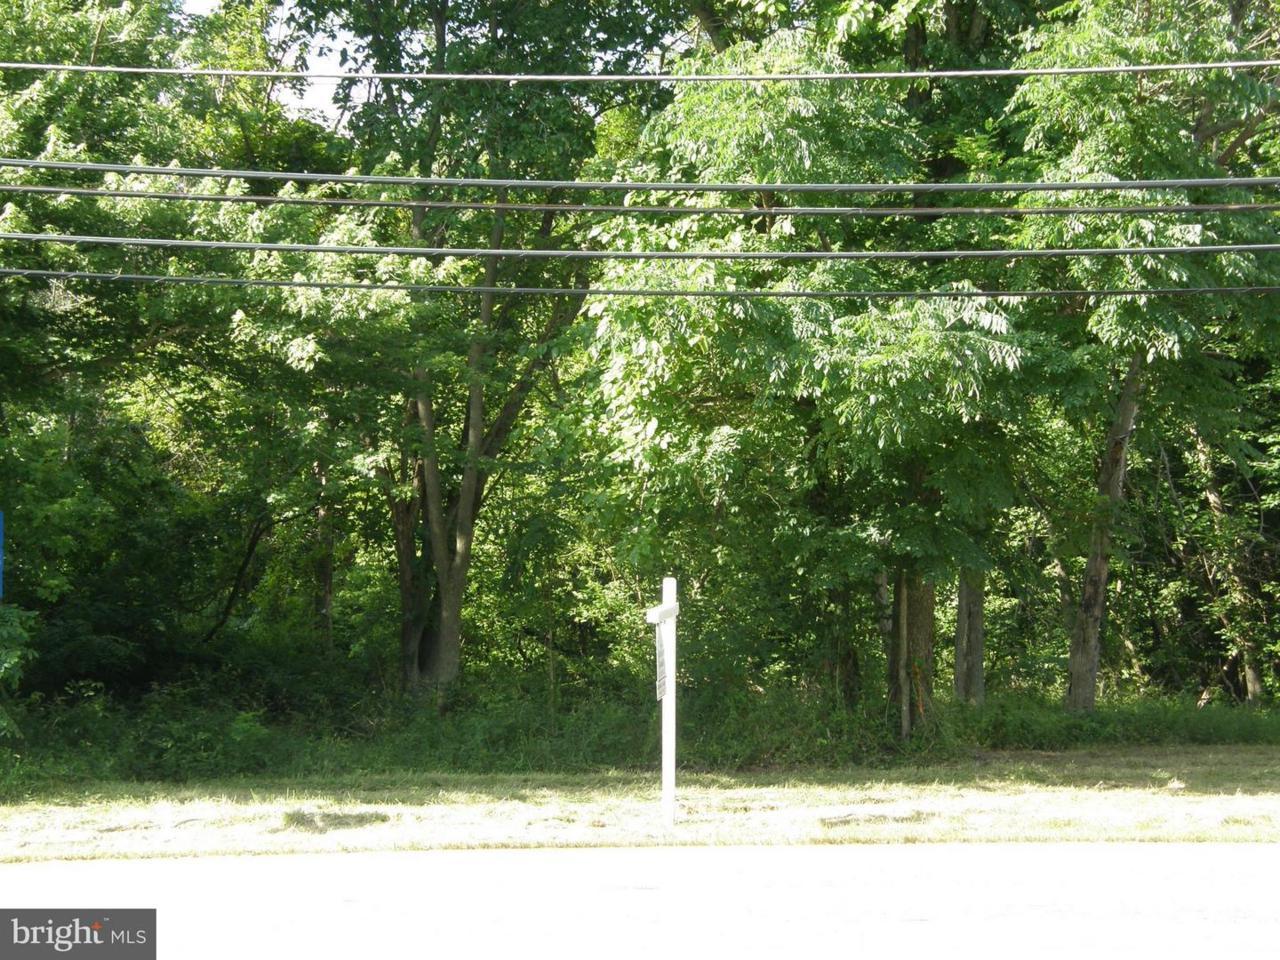 1449 Snug Harbor Road - Photo 1